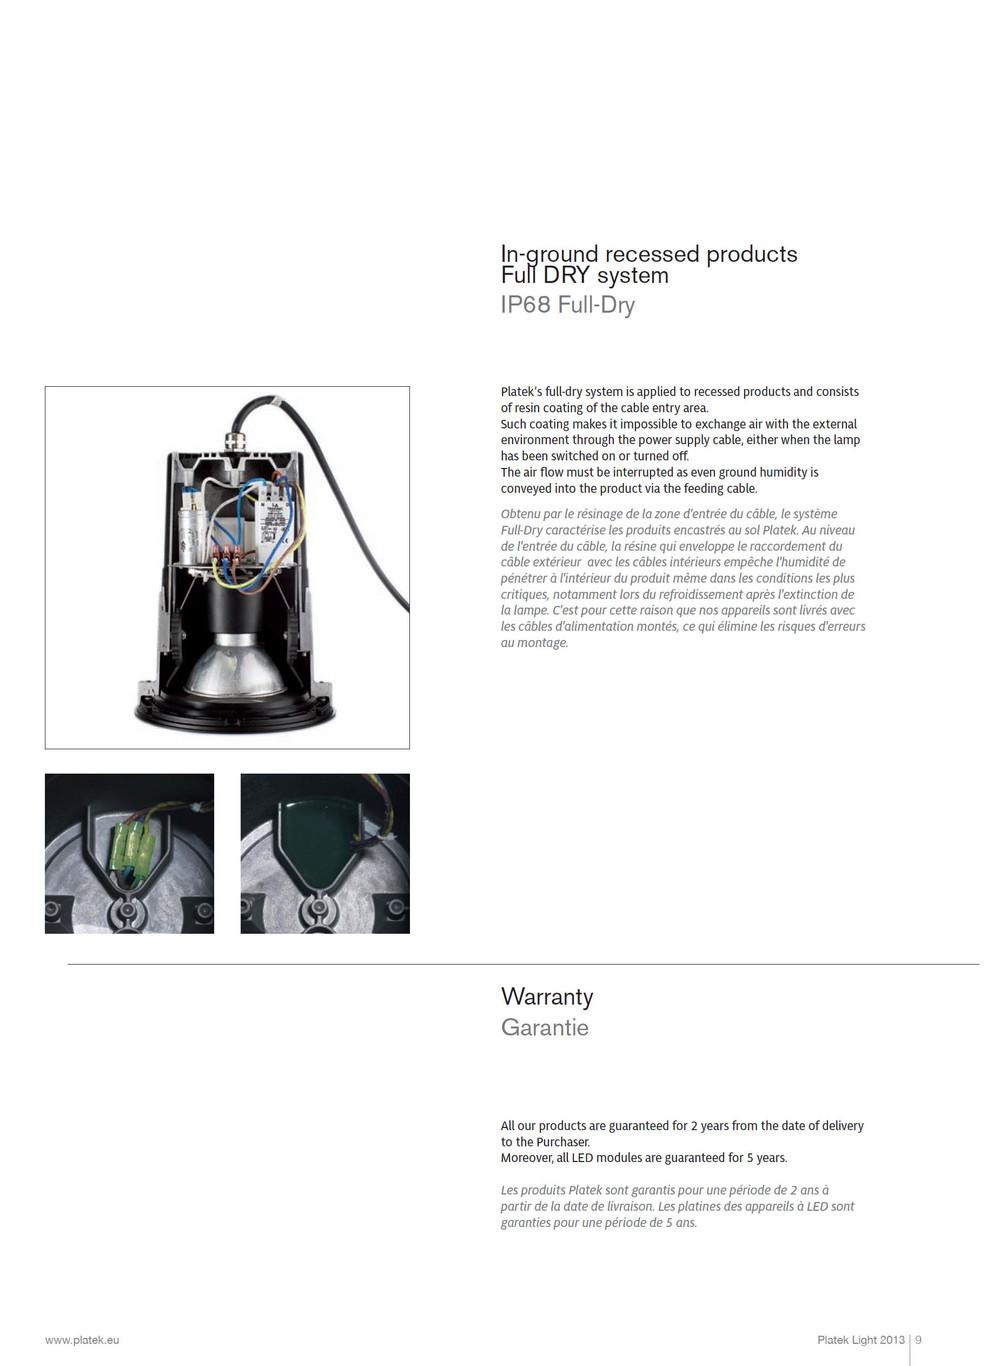 Platek - Warranty and IP68 Full Dry System.jpg